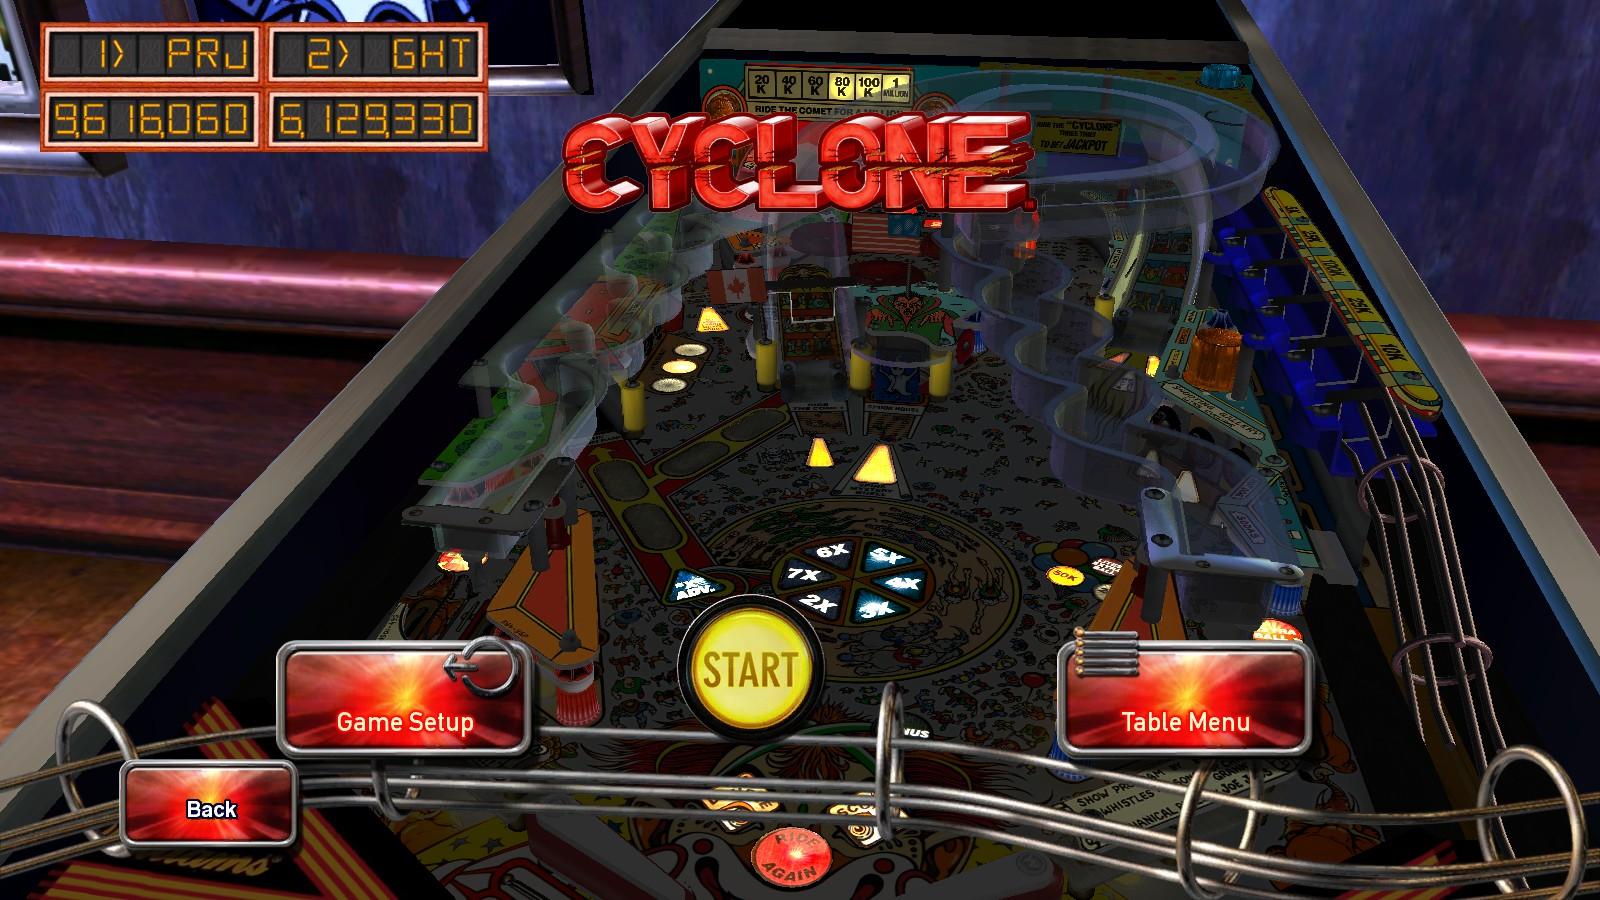 Deteacher: Pinball Arcade: Cyclone (PC) 9,616,060 points on 2015-08-14 20:54:59